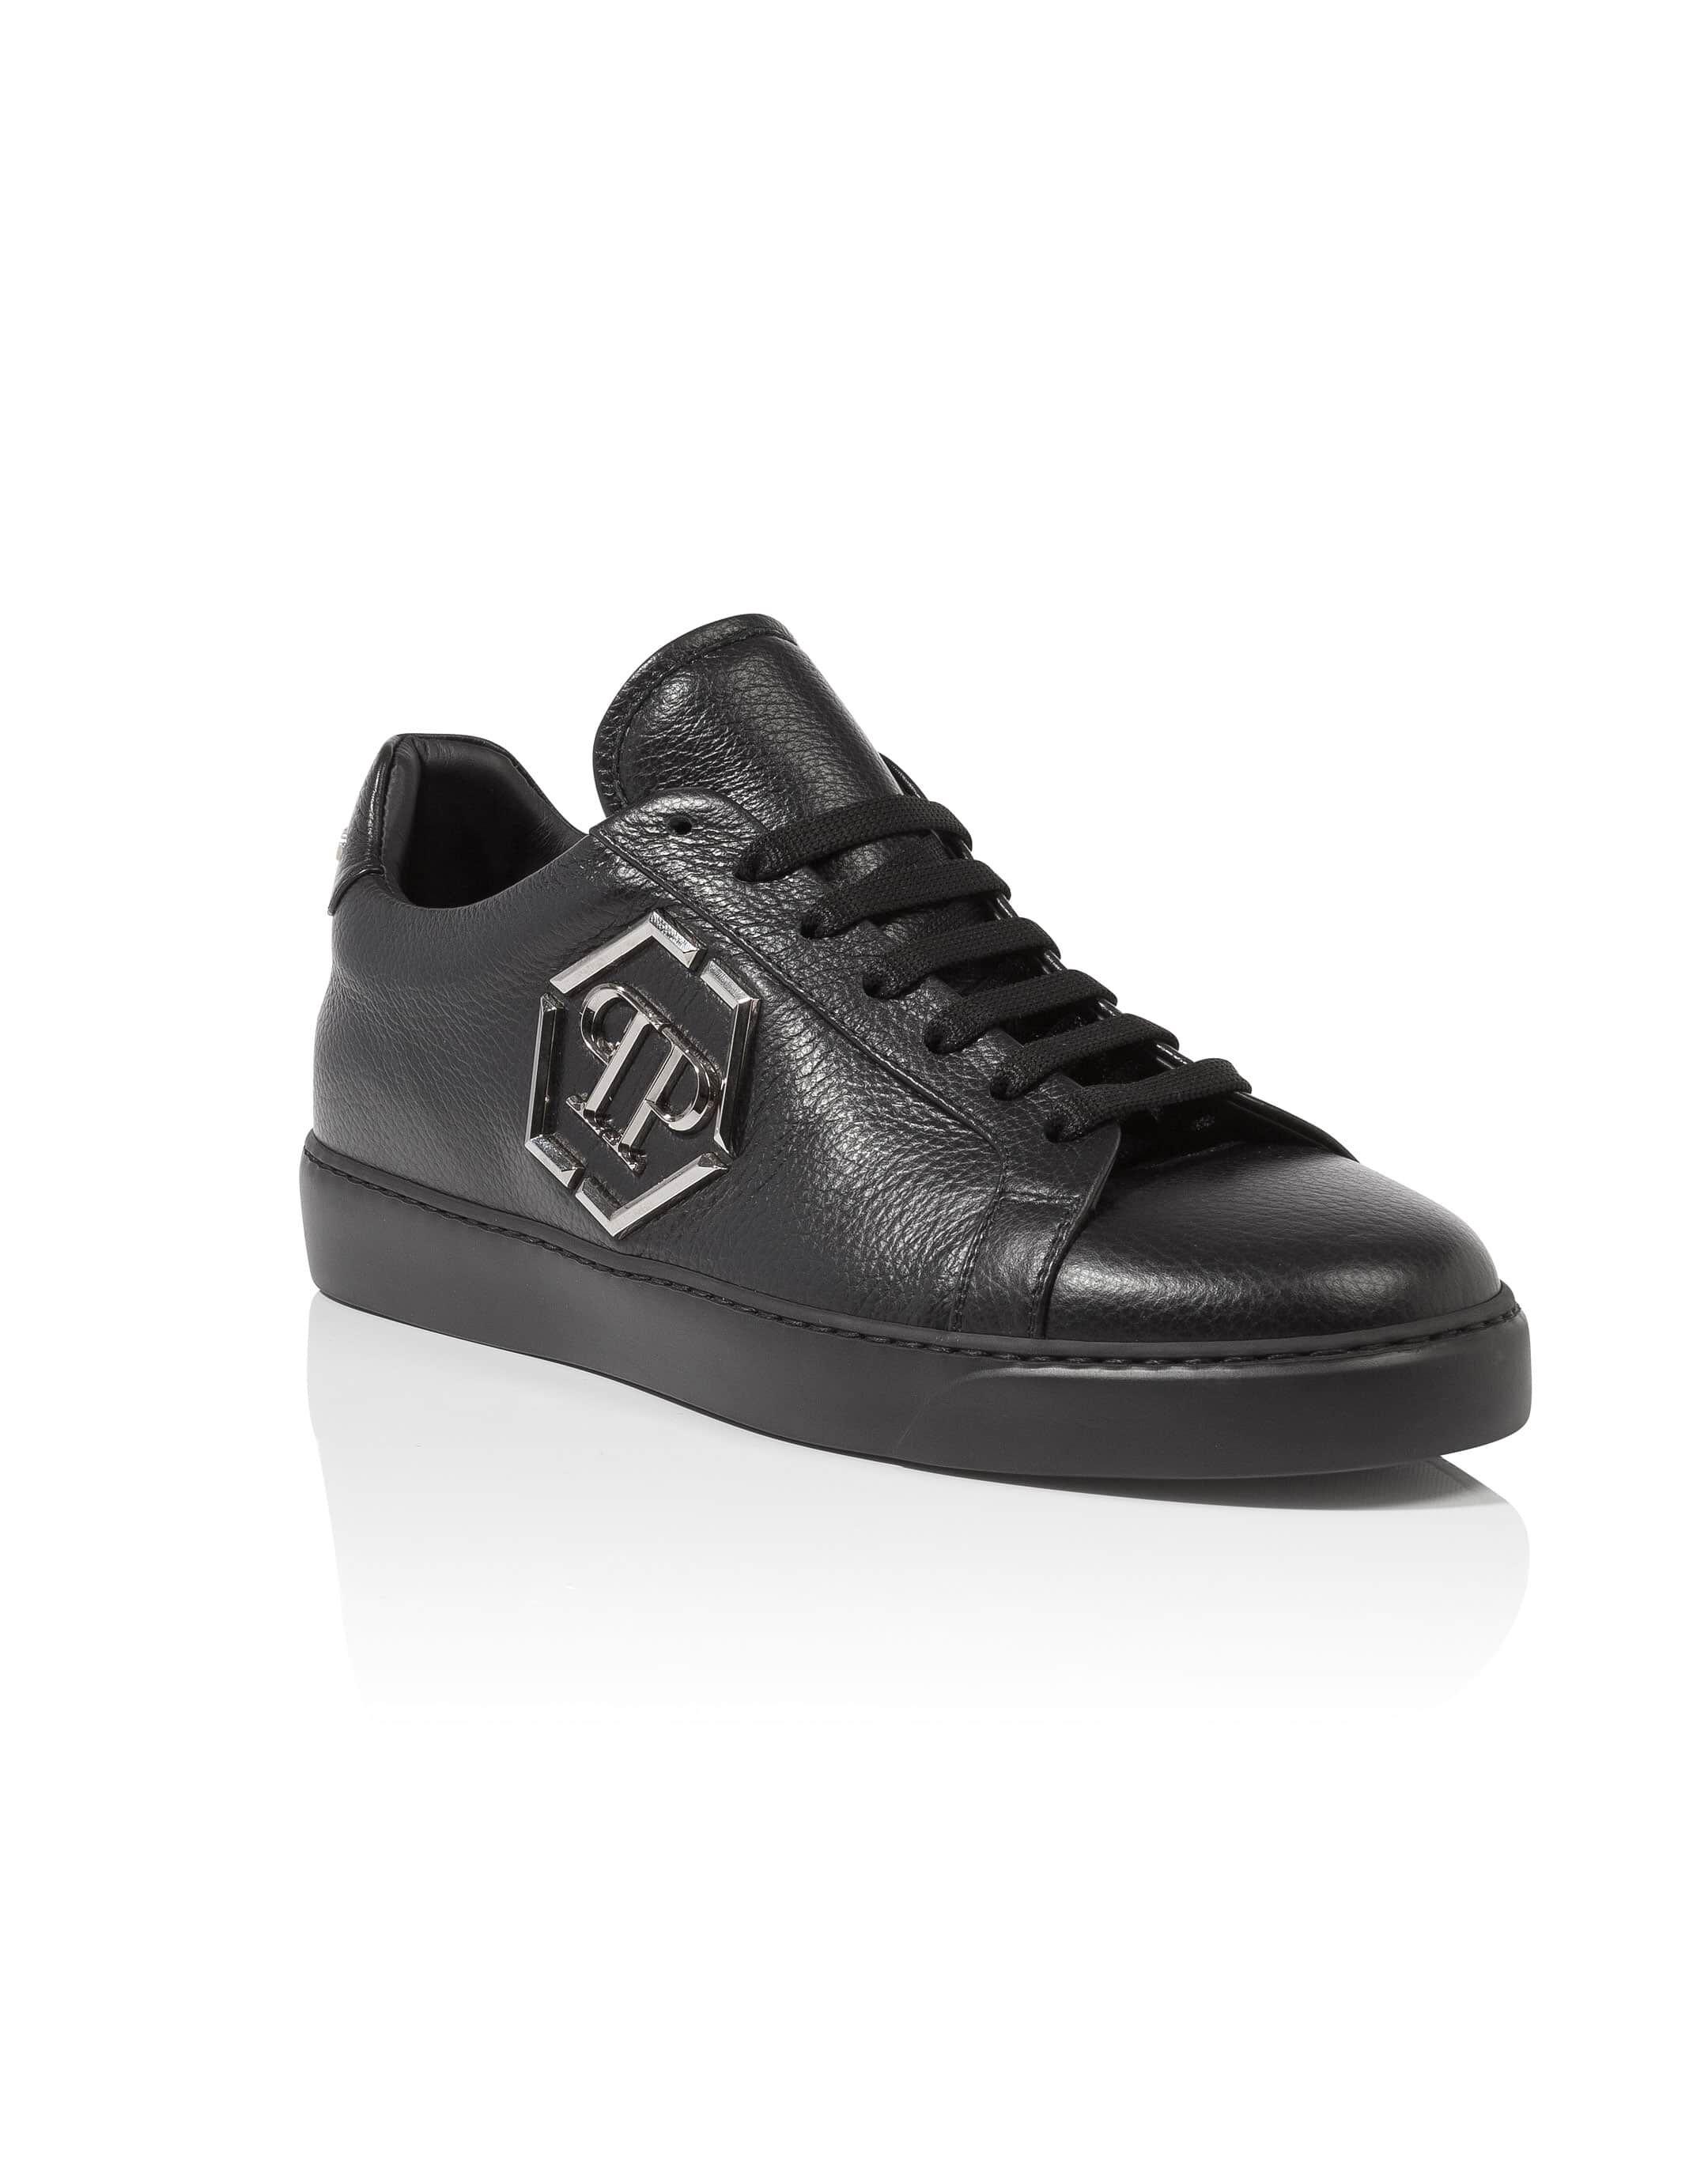 low top sneakers - Black Philipp Plein qo69Tdg